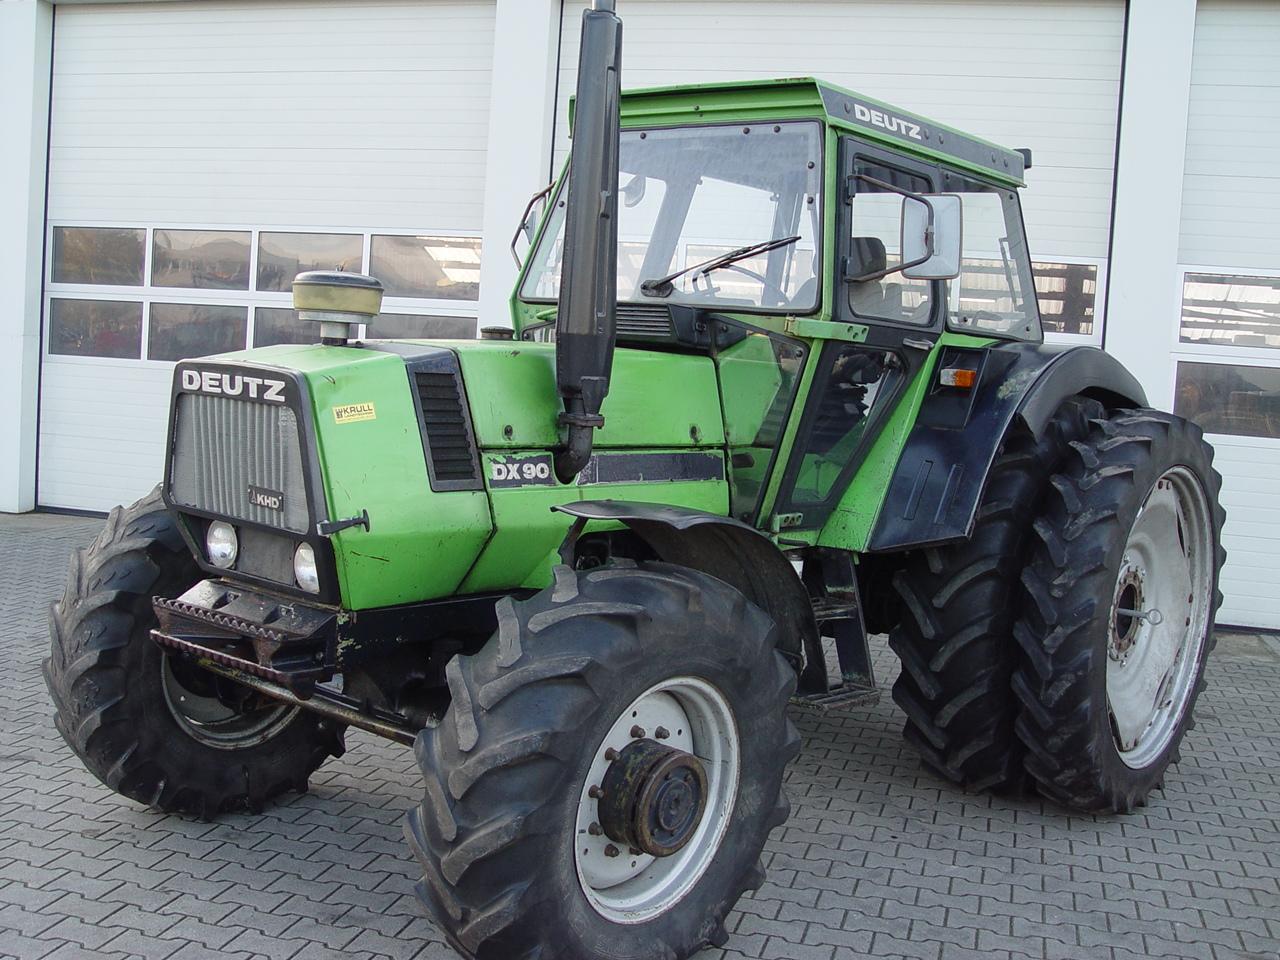 Deutz-Fahr DX 90